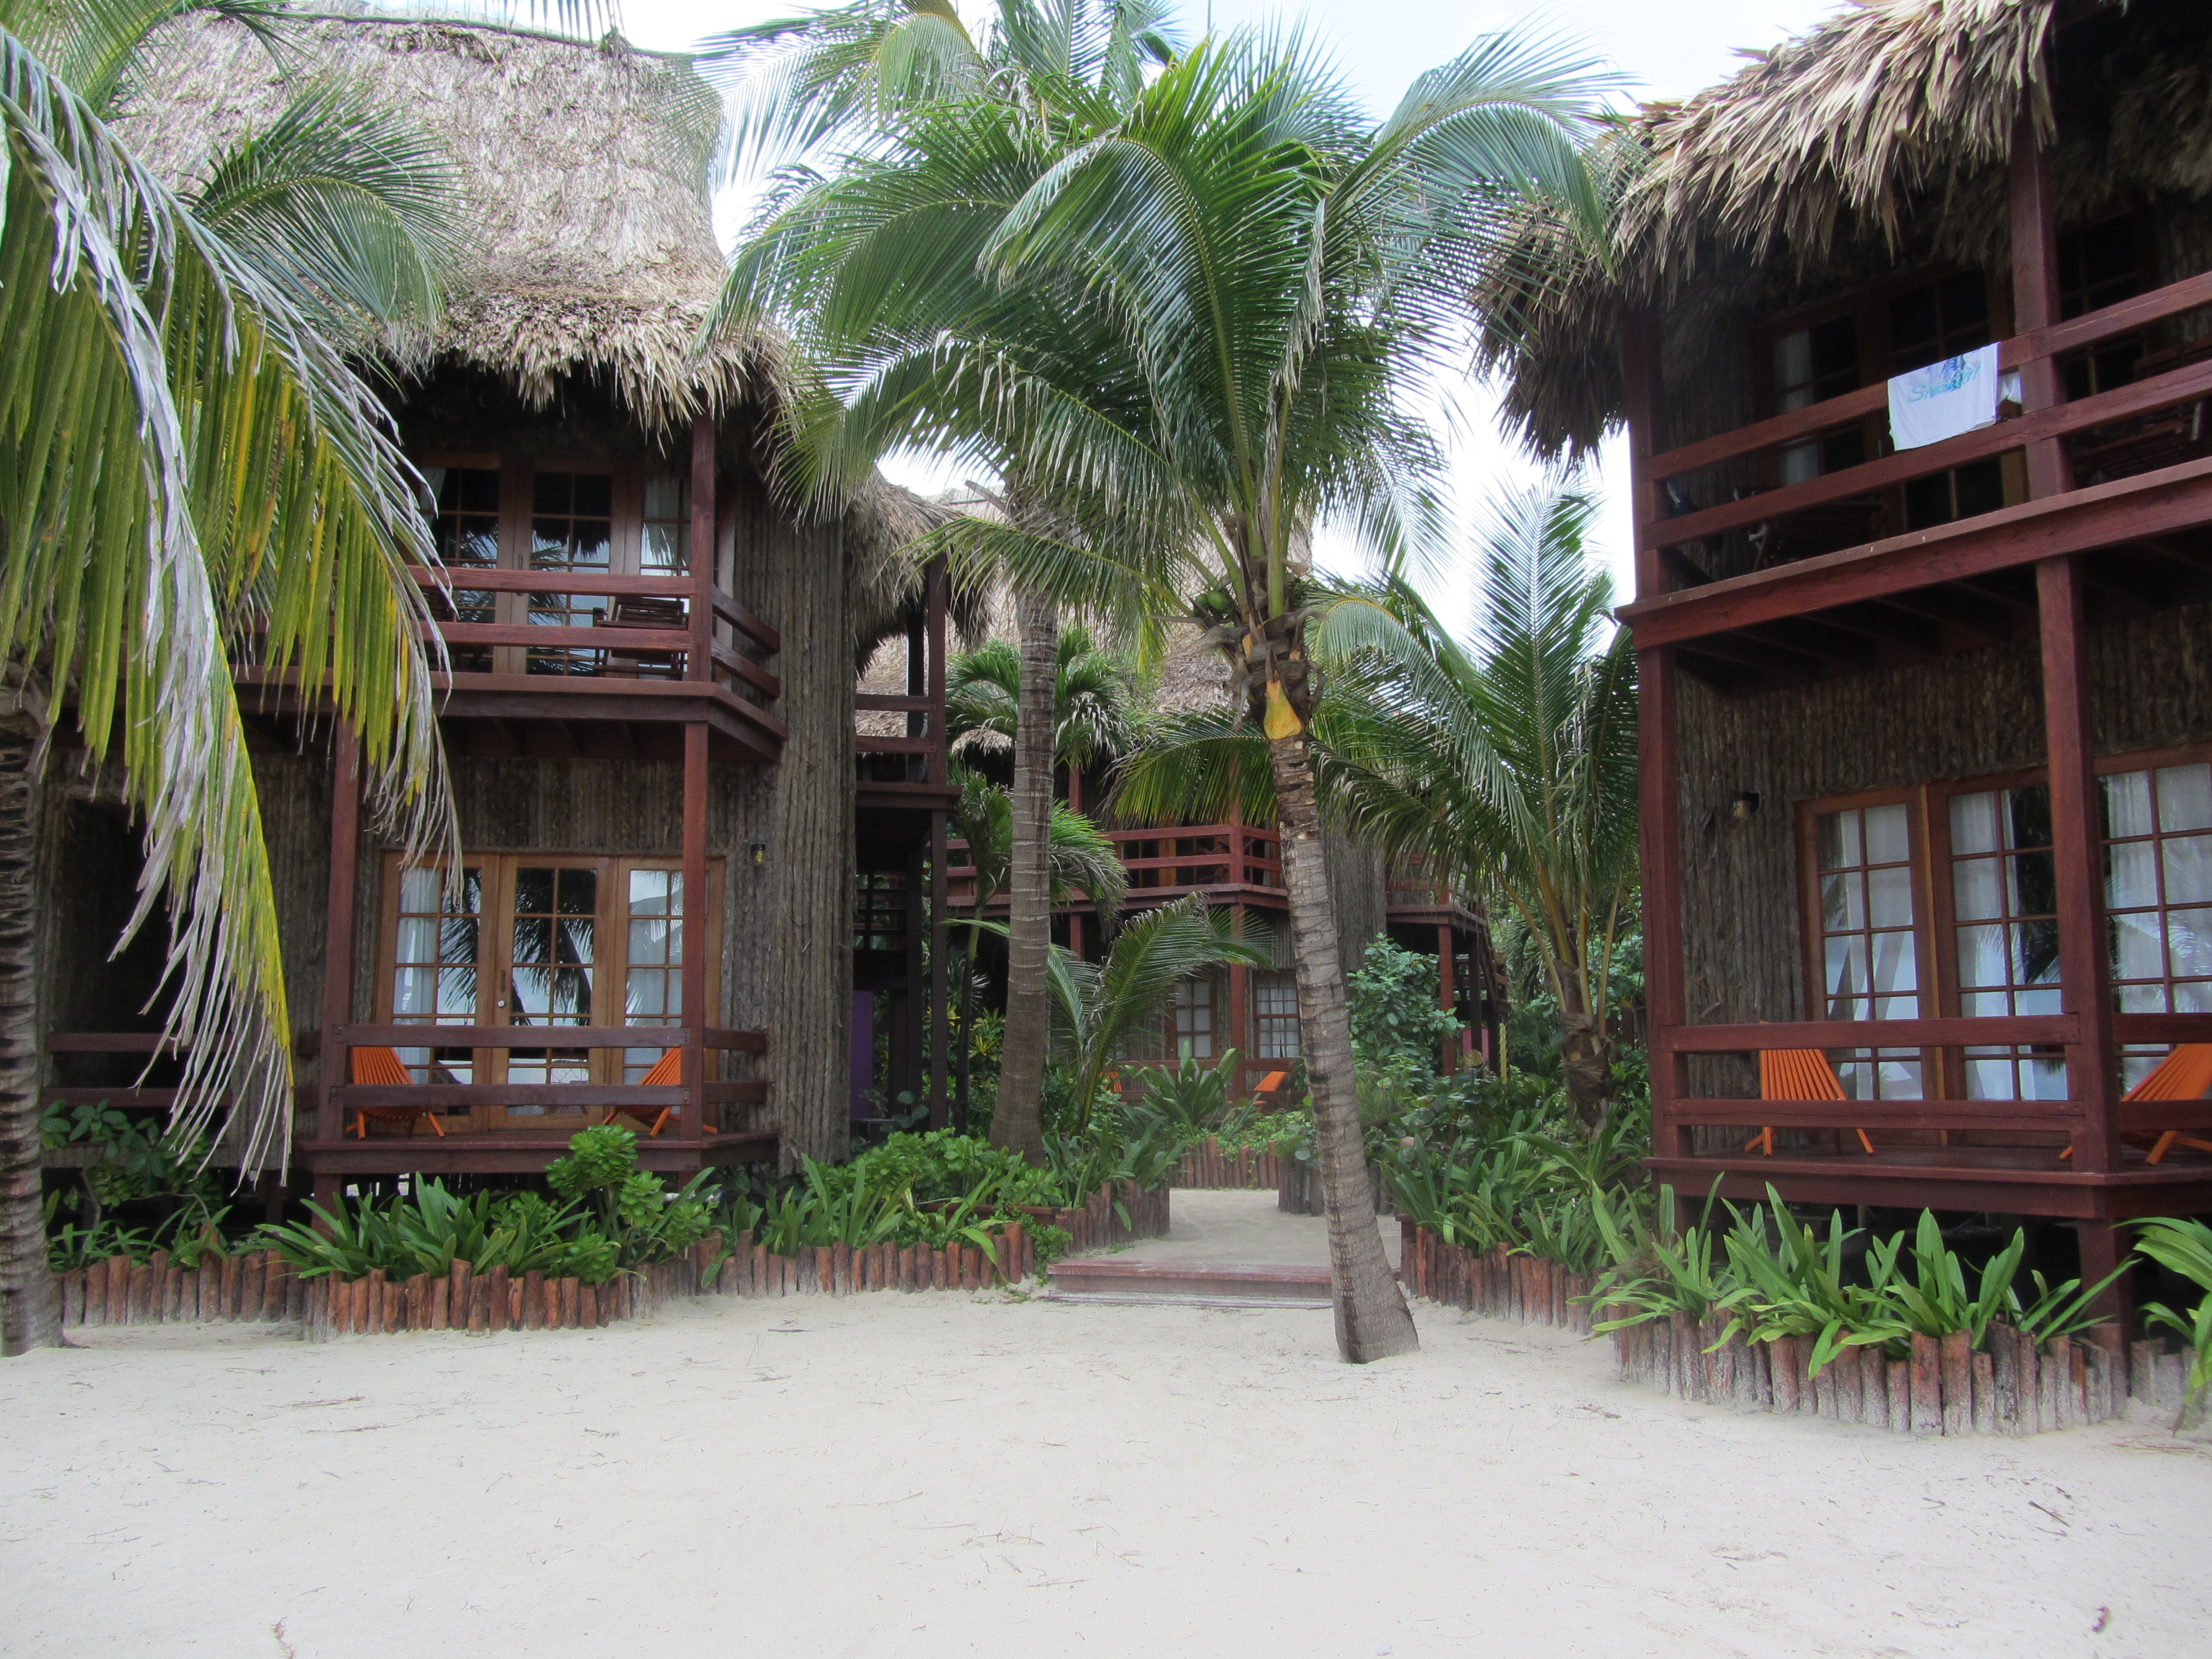 4 Favorite Hotels  BB Resorts  Historic Hotels